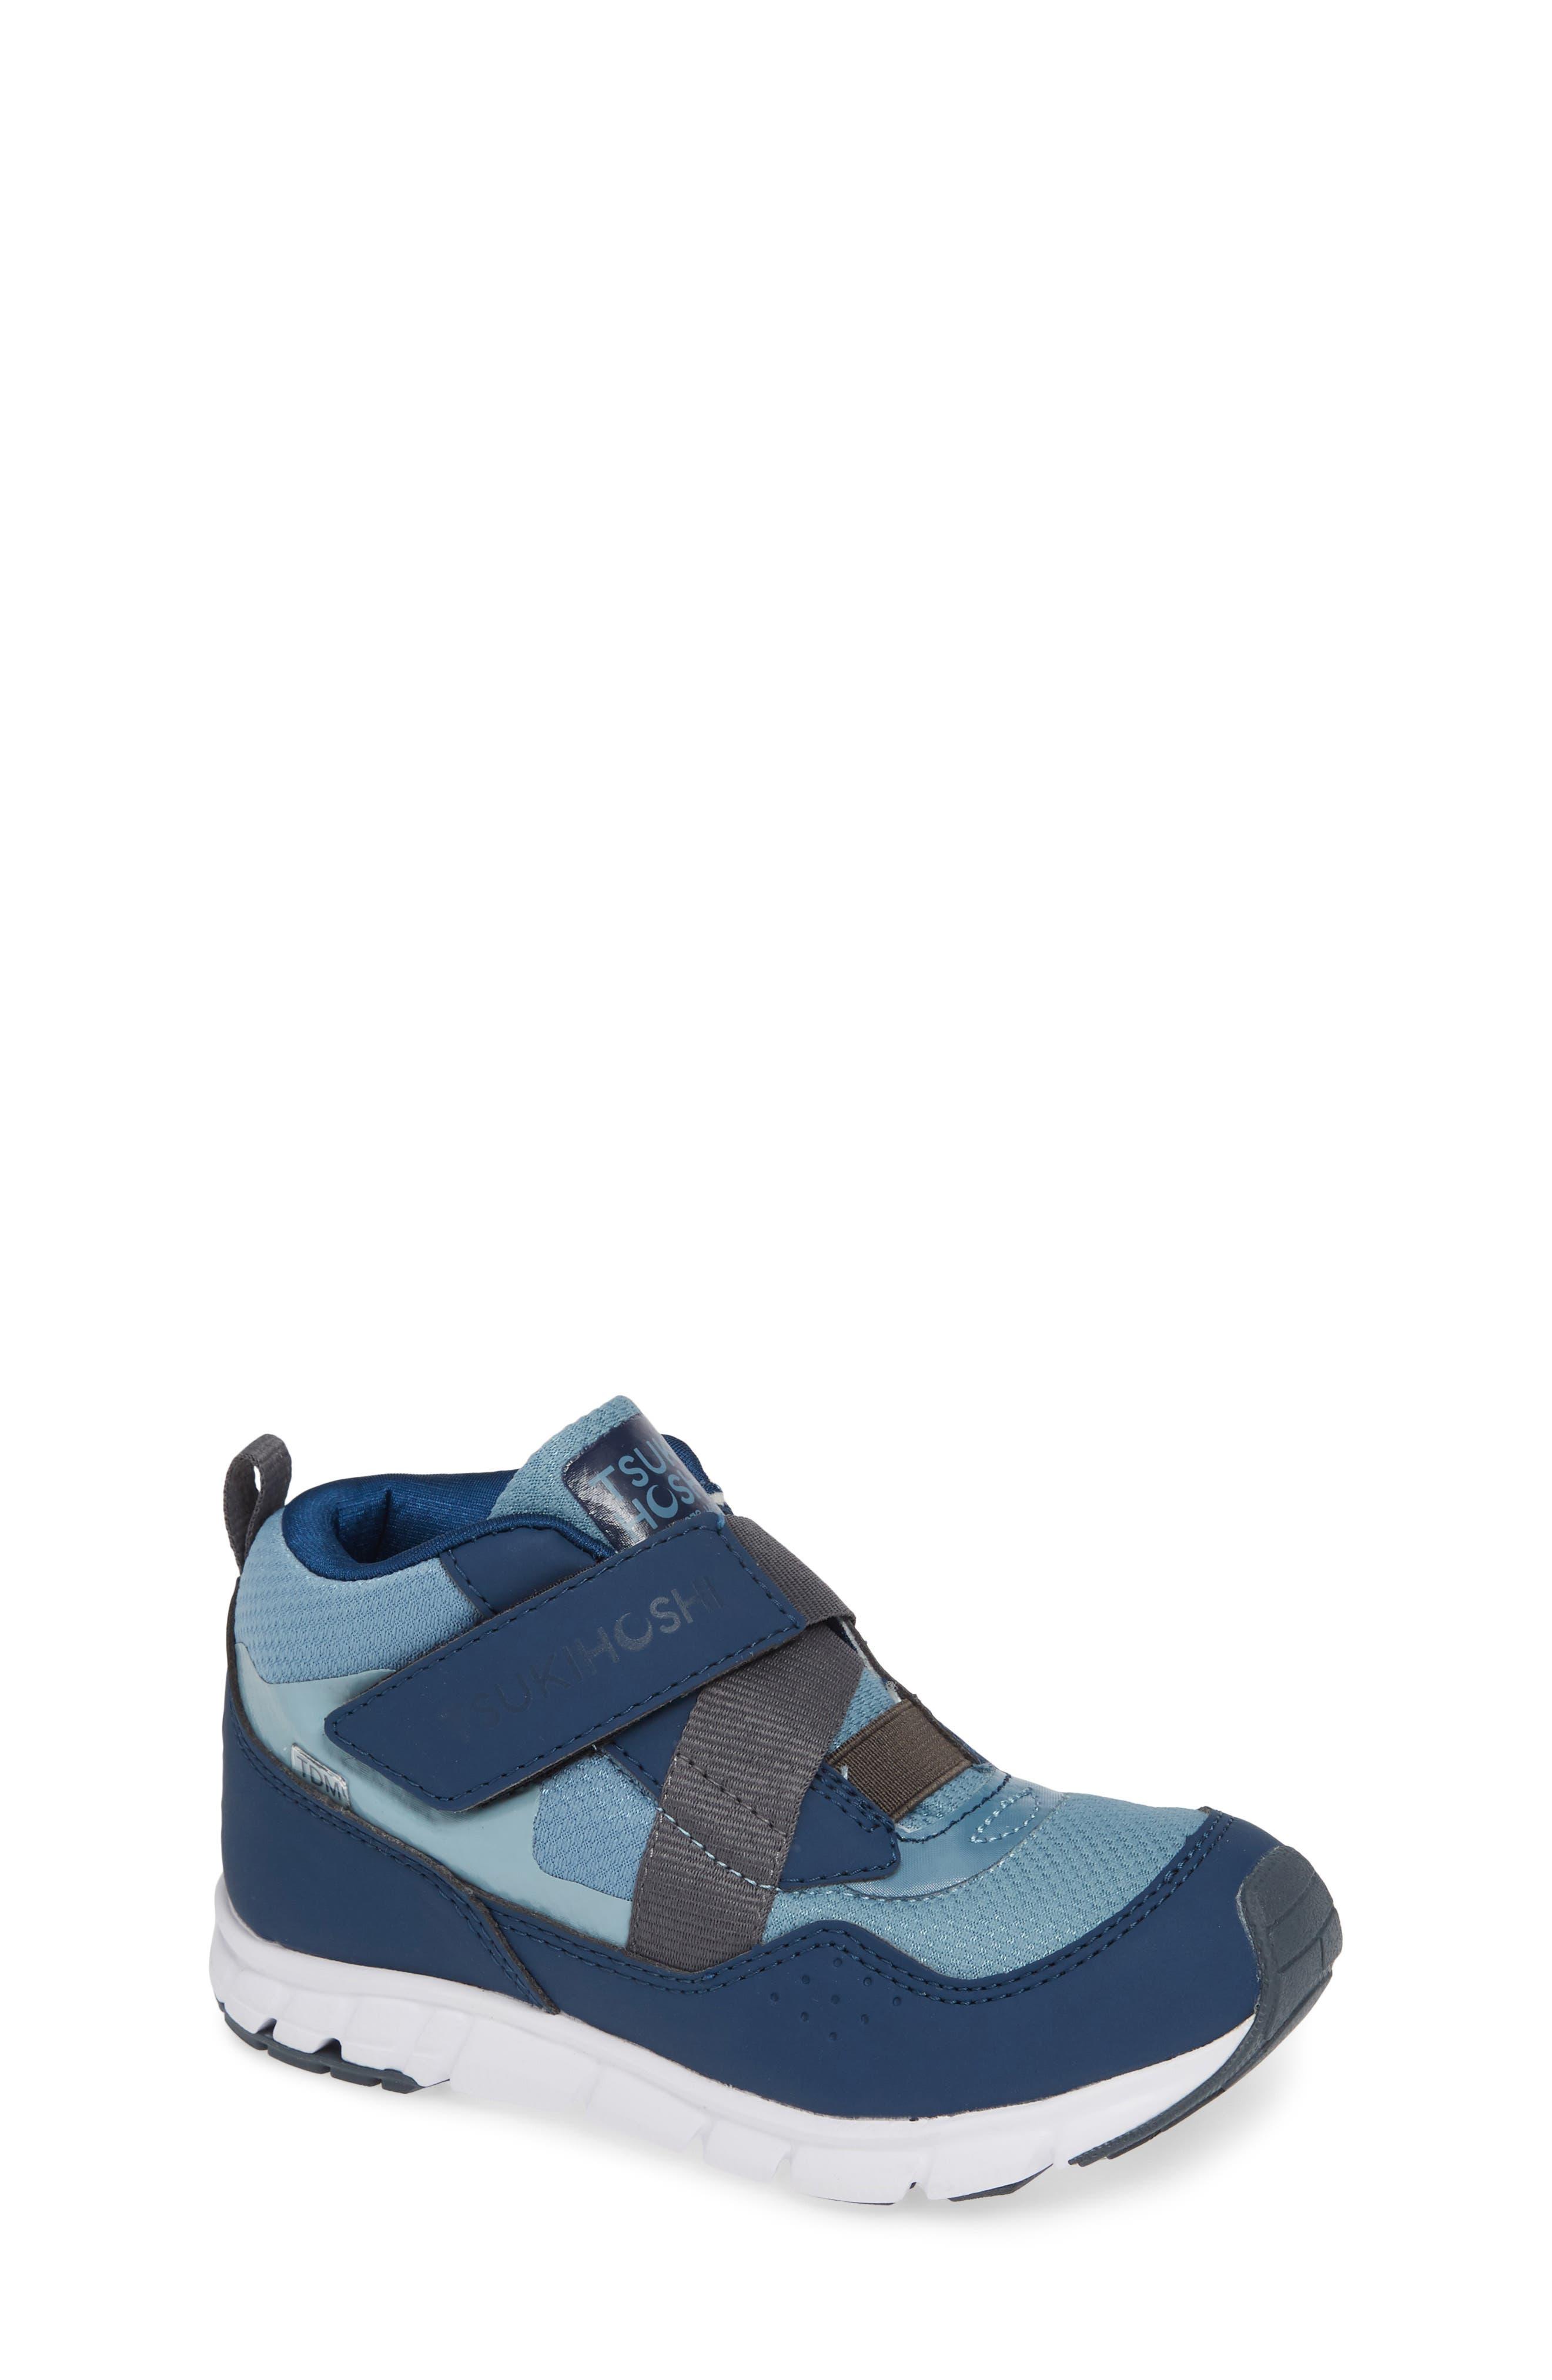 TSUKIHOSHI, Tokyo Waterproof Sneaker, Main thumbnail 1, color, NAVY/ SEA